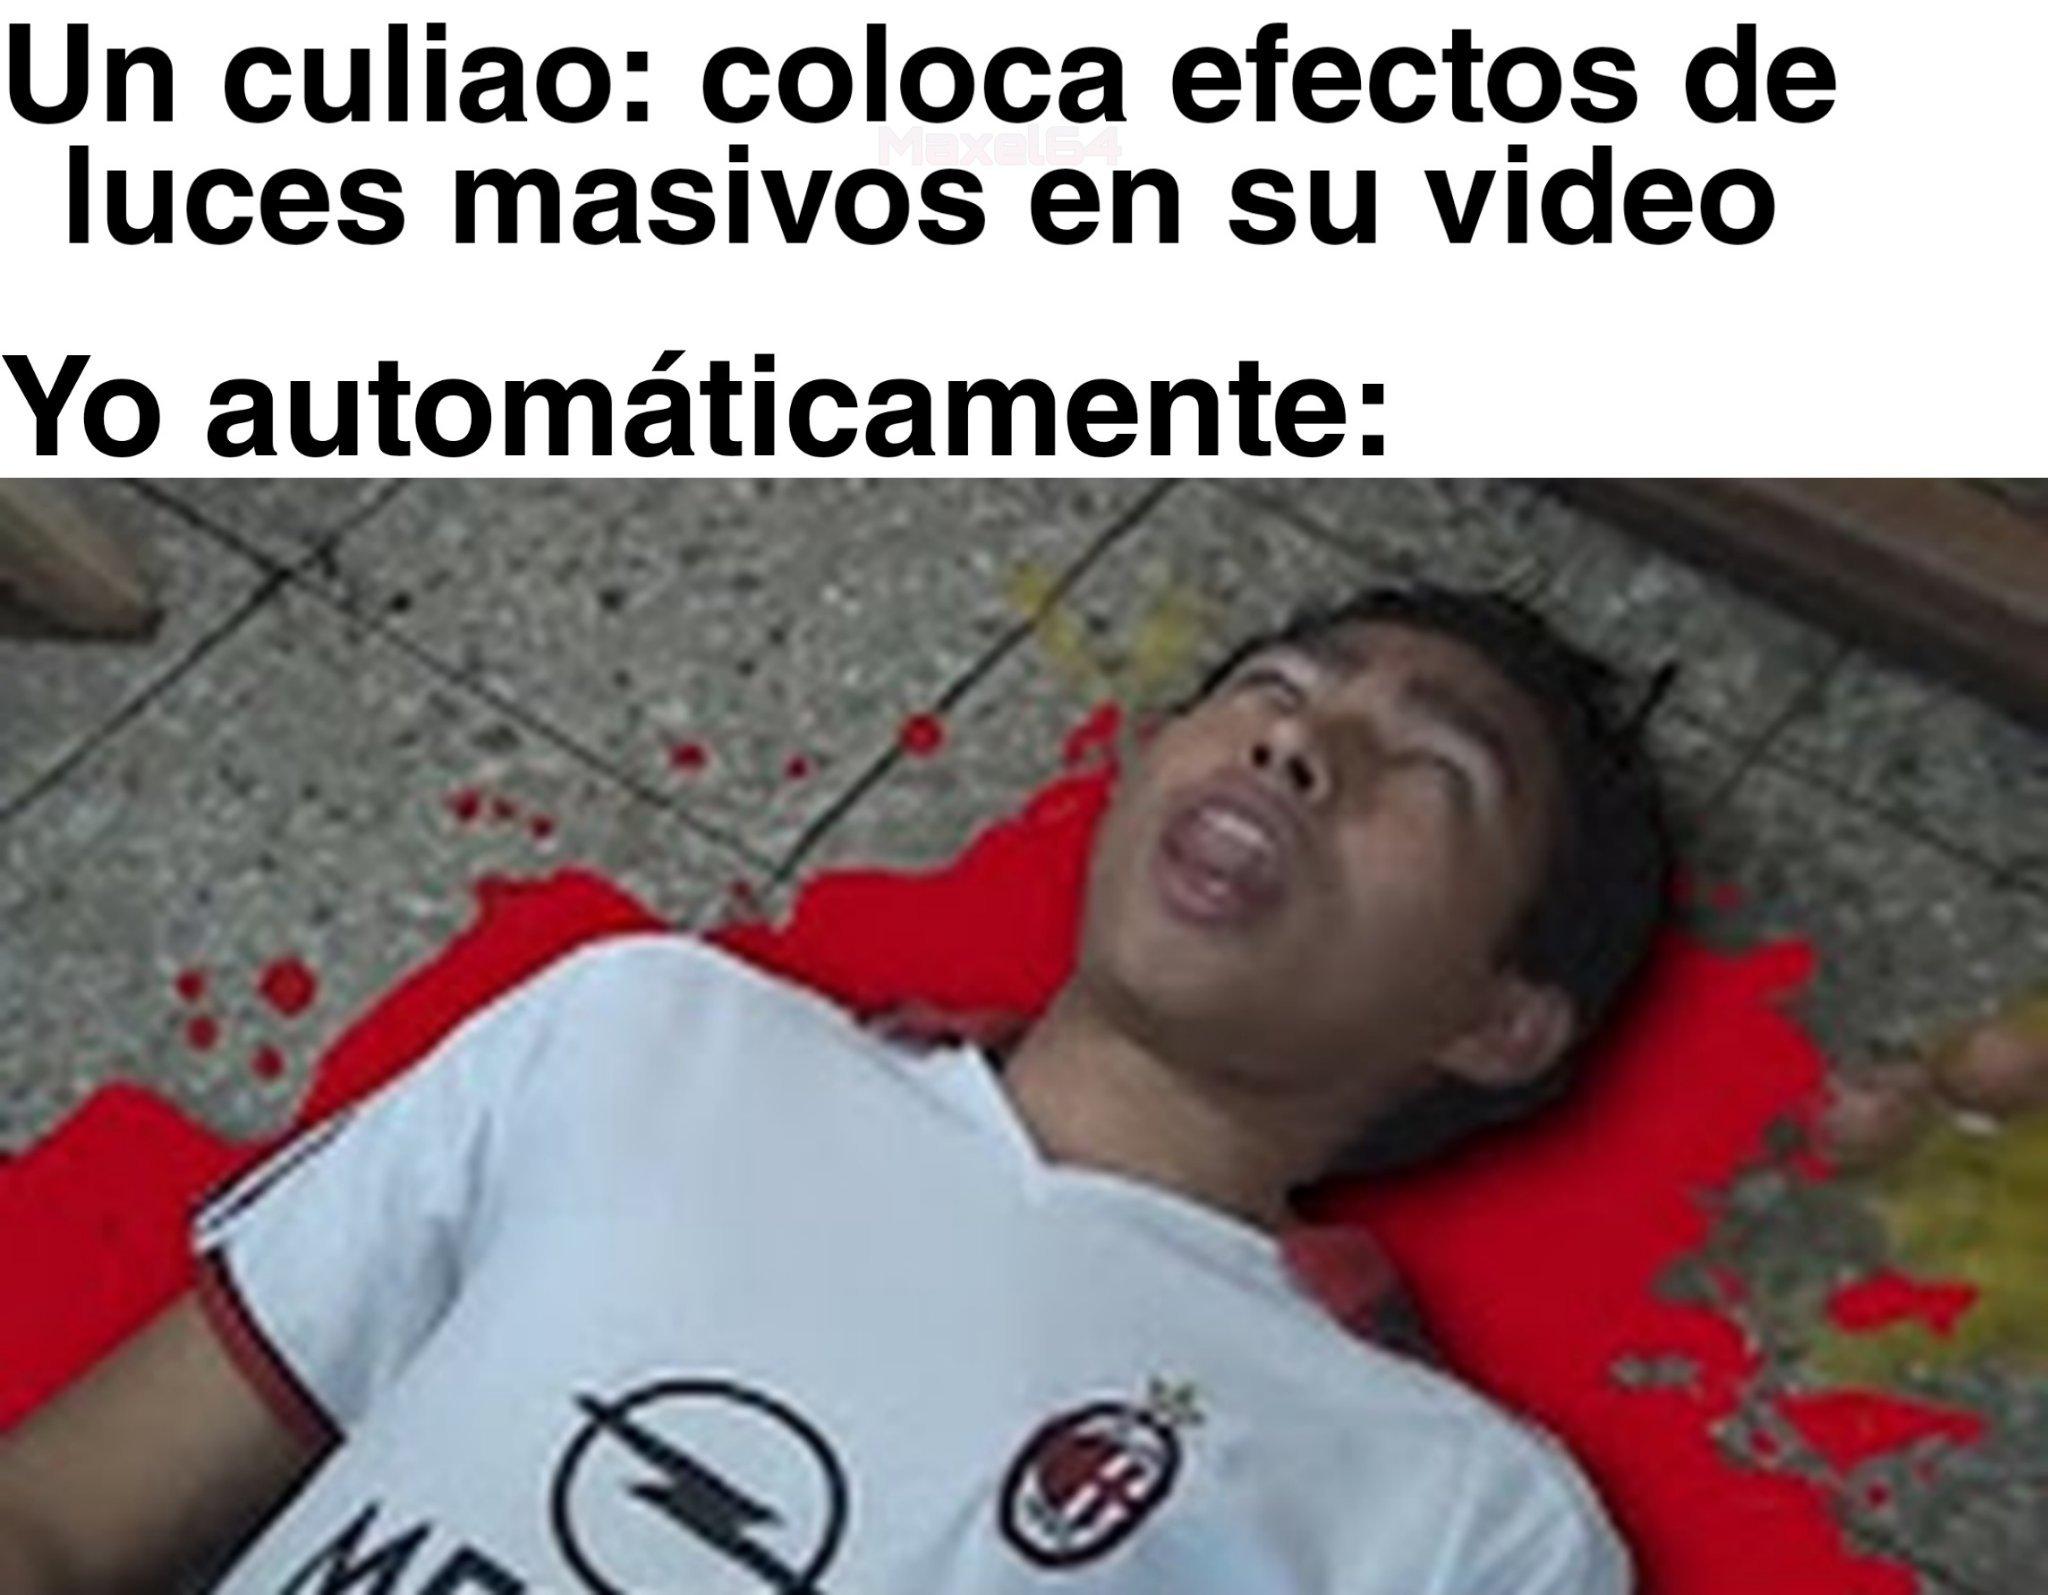 Putos videos MLG - meme